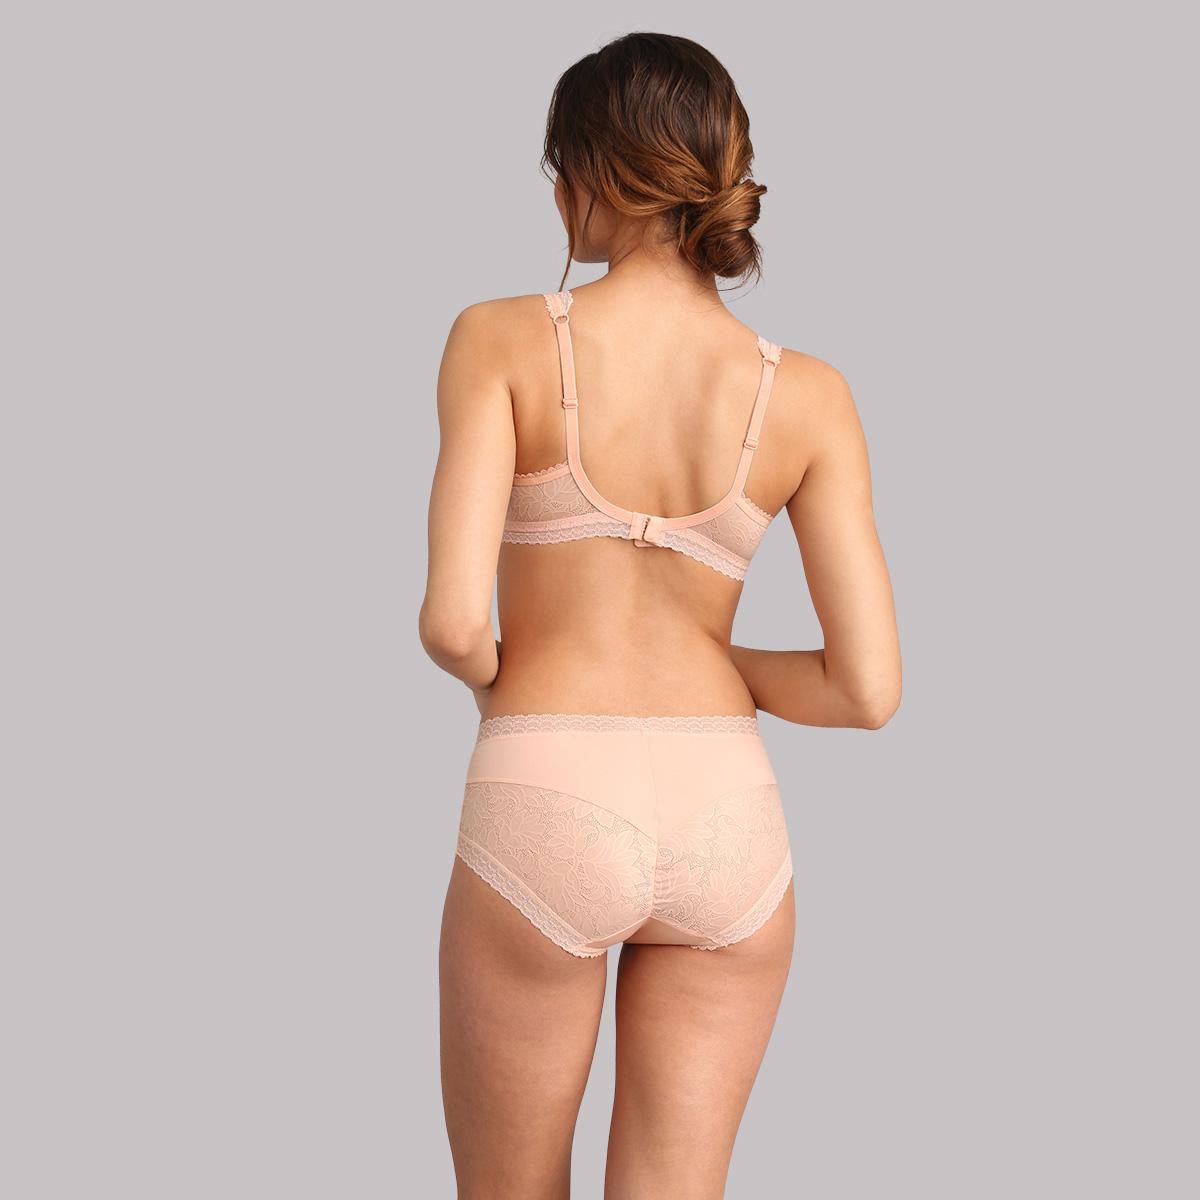 Balcony bra in sea salt pink - Invisible Elegance, , PLAYTEX